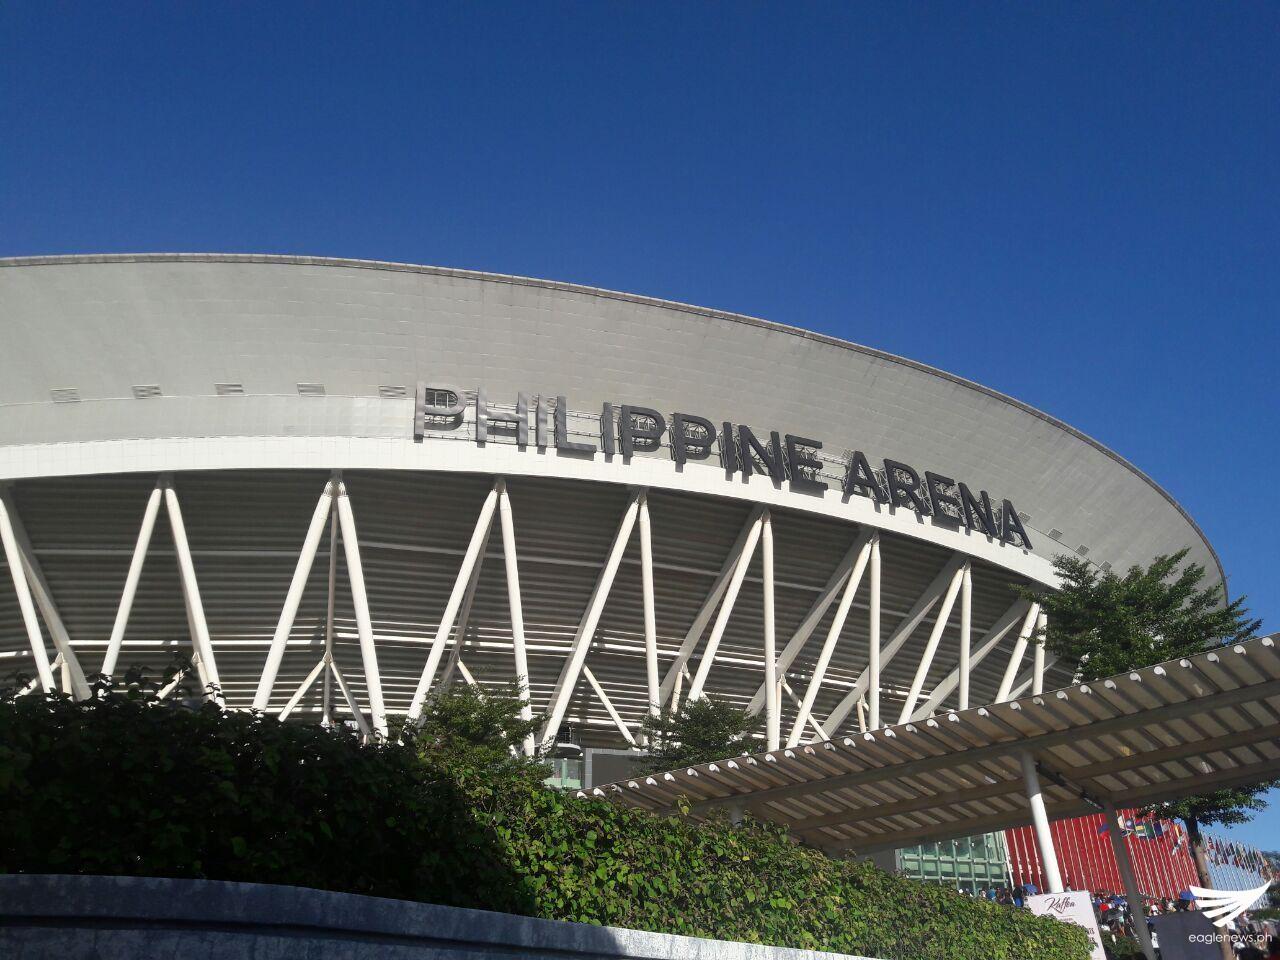 philippine-arena00002